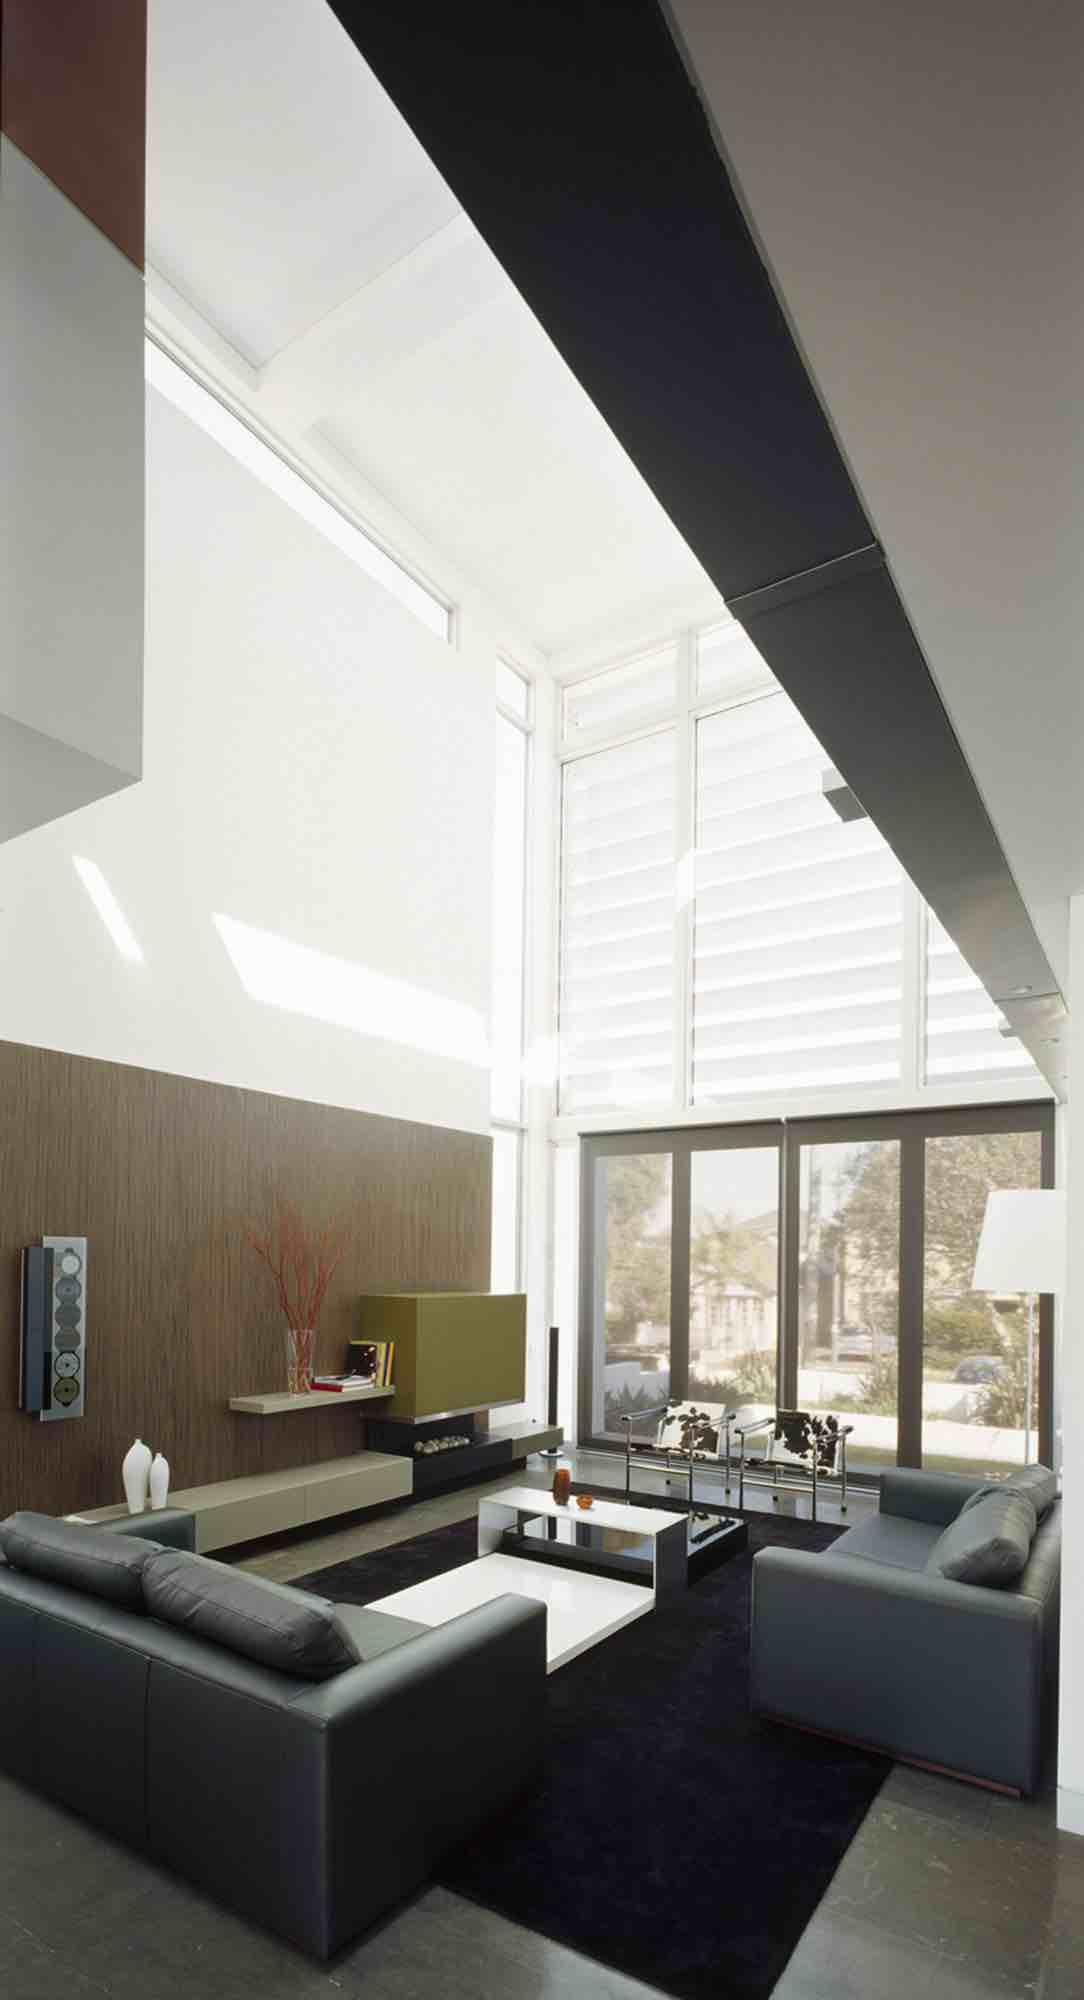 minosa-design-high-voids-sitting-room-modern-custom-joinery-gas-fireplace-limestone-floor-03